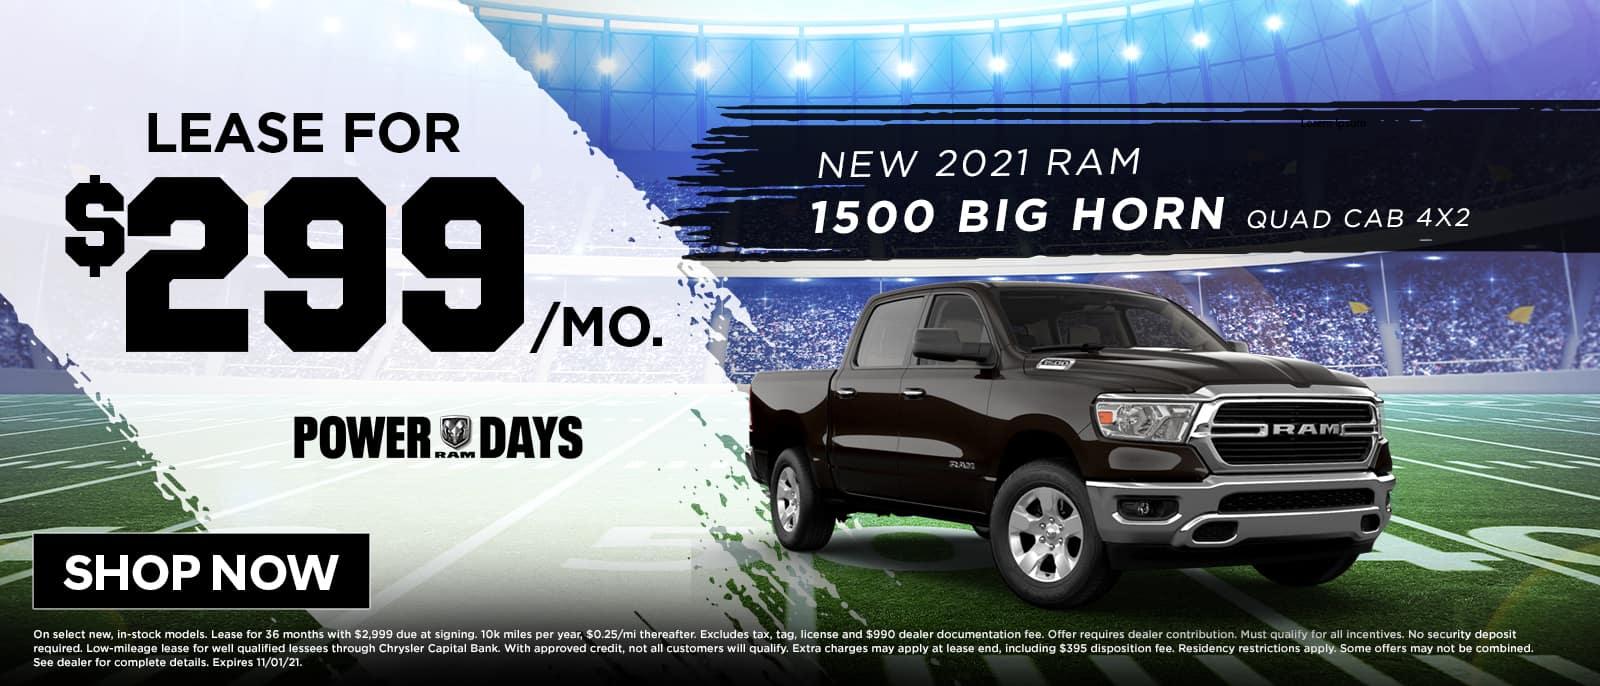 203-1021-SCO5095_1500 Big Horn